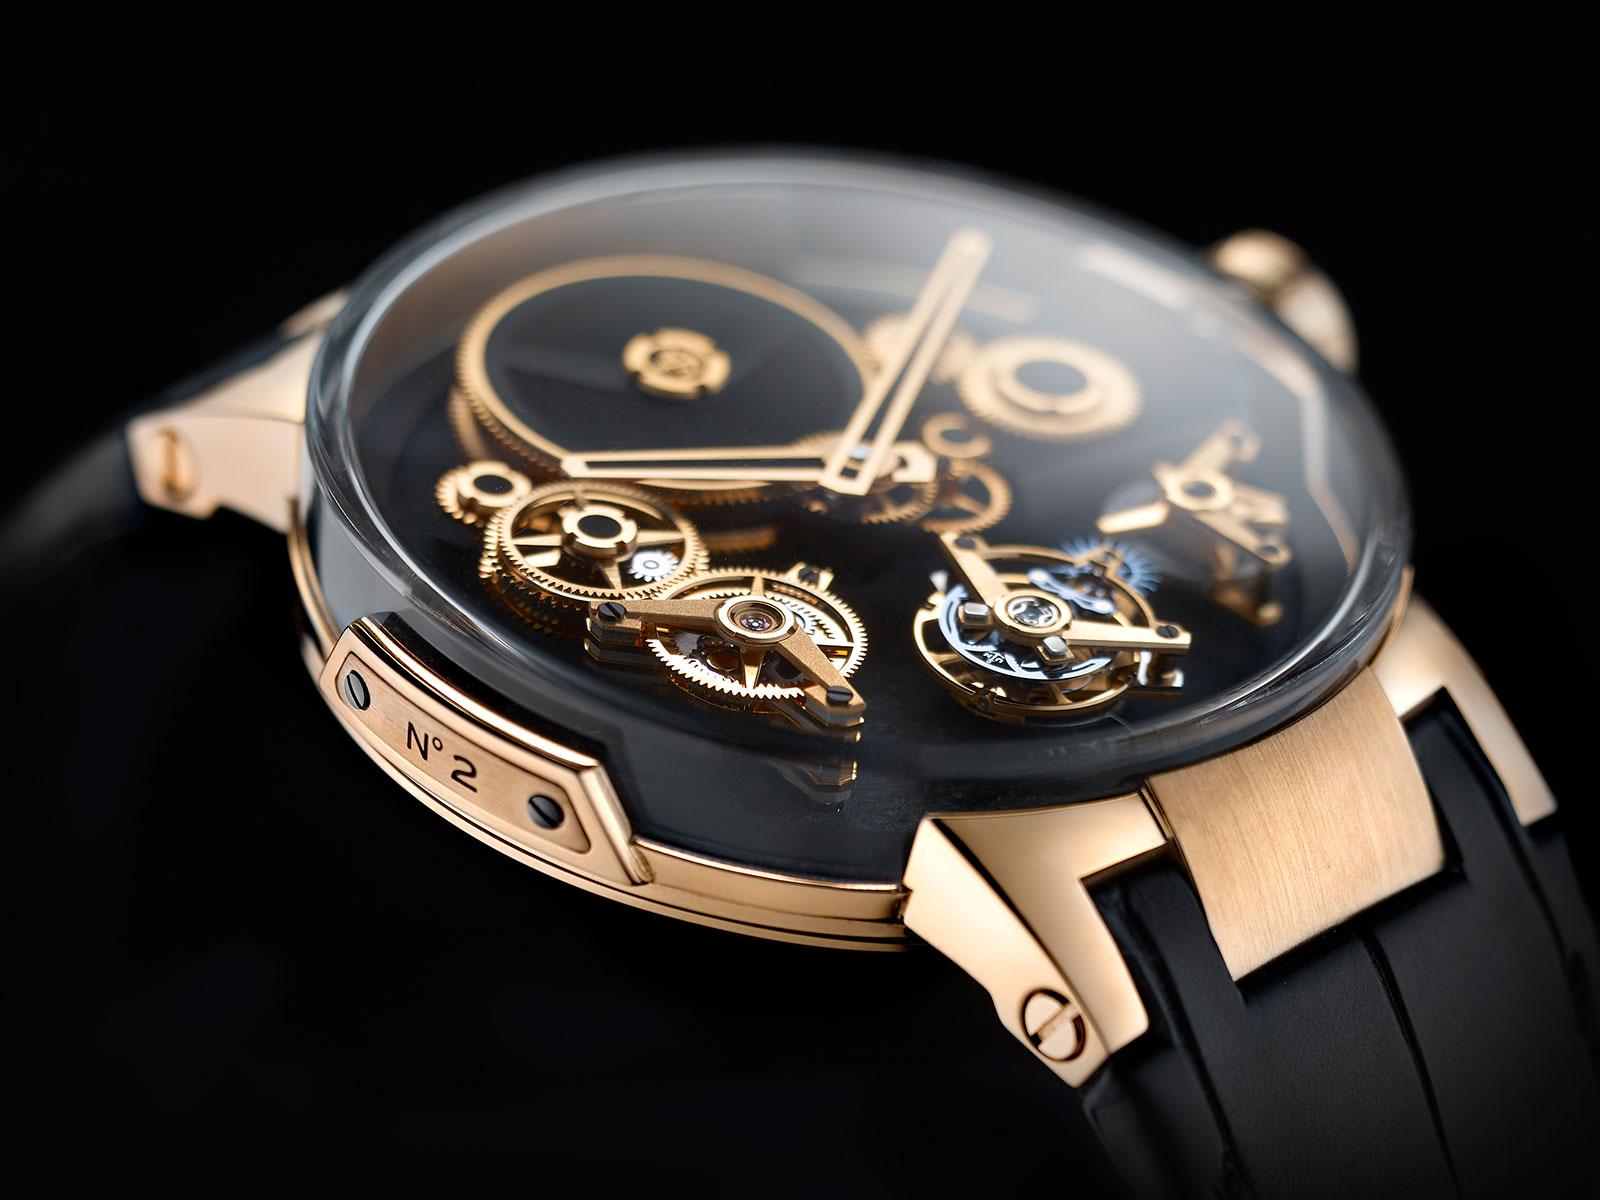 Ulysse-Nardin-Executive-Tourbillon-Free-Wheel watch 2